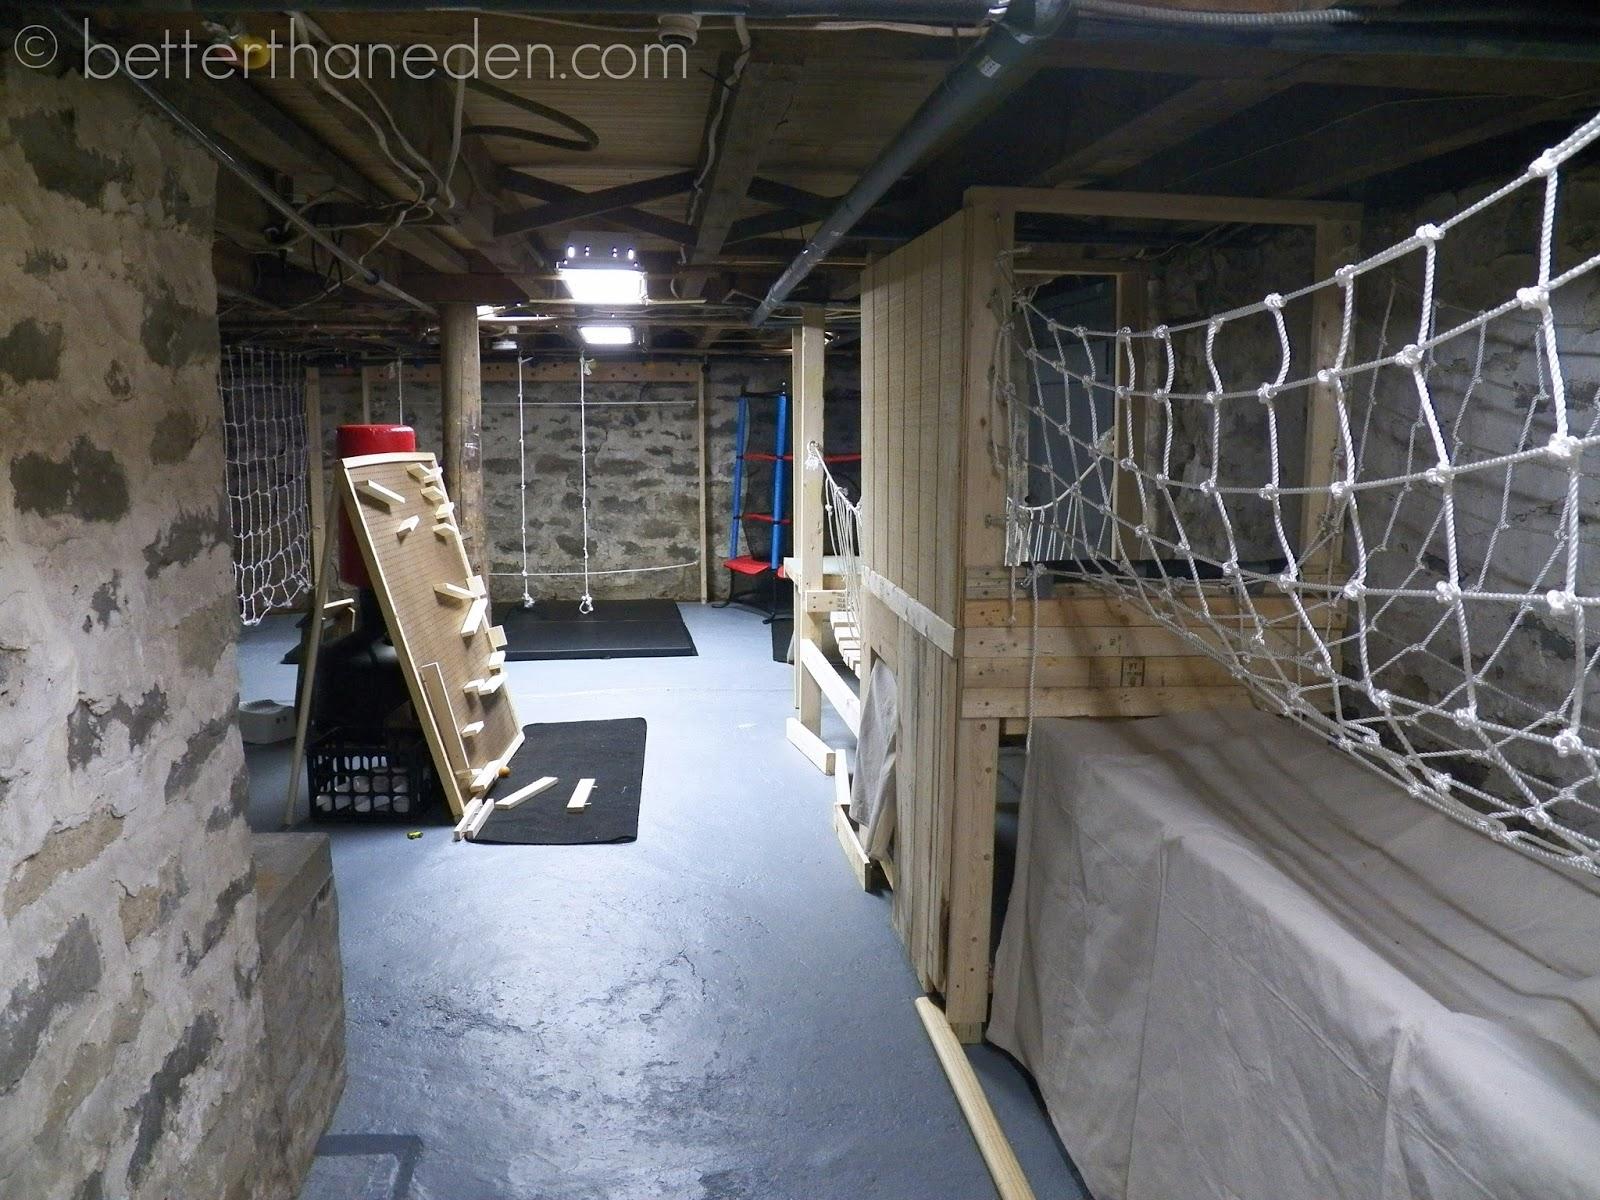 Basement Construction Ideas To Strengthen Your Basement A Basement Gym For The Boys